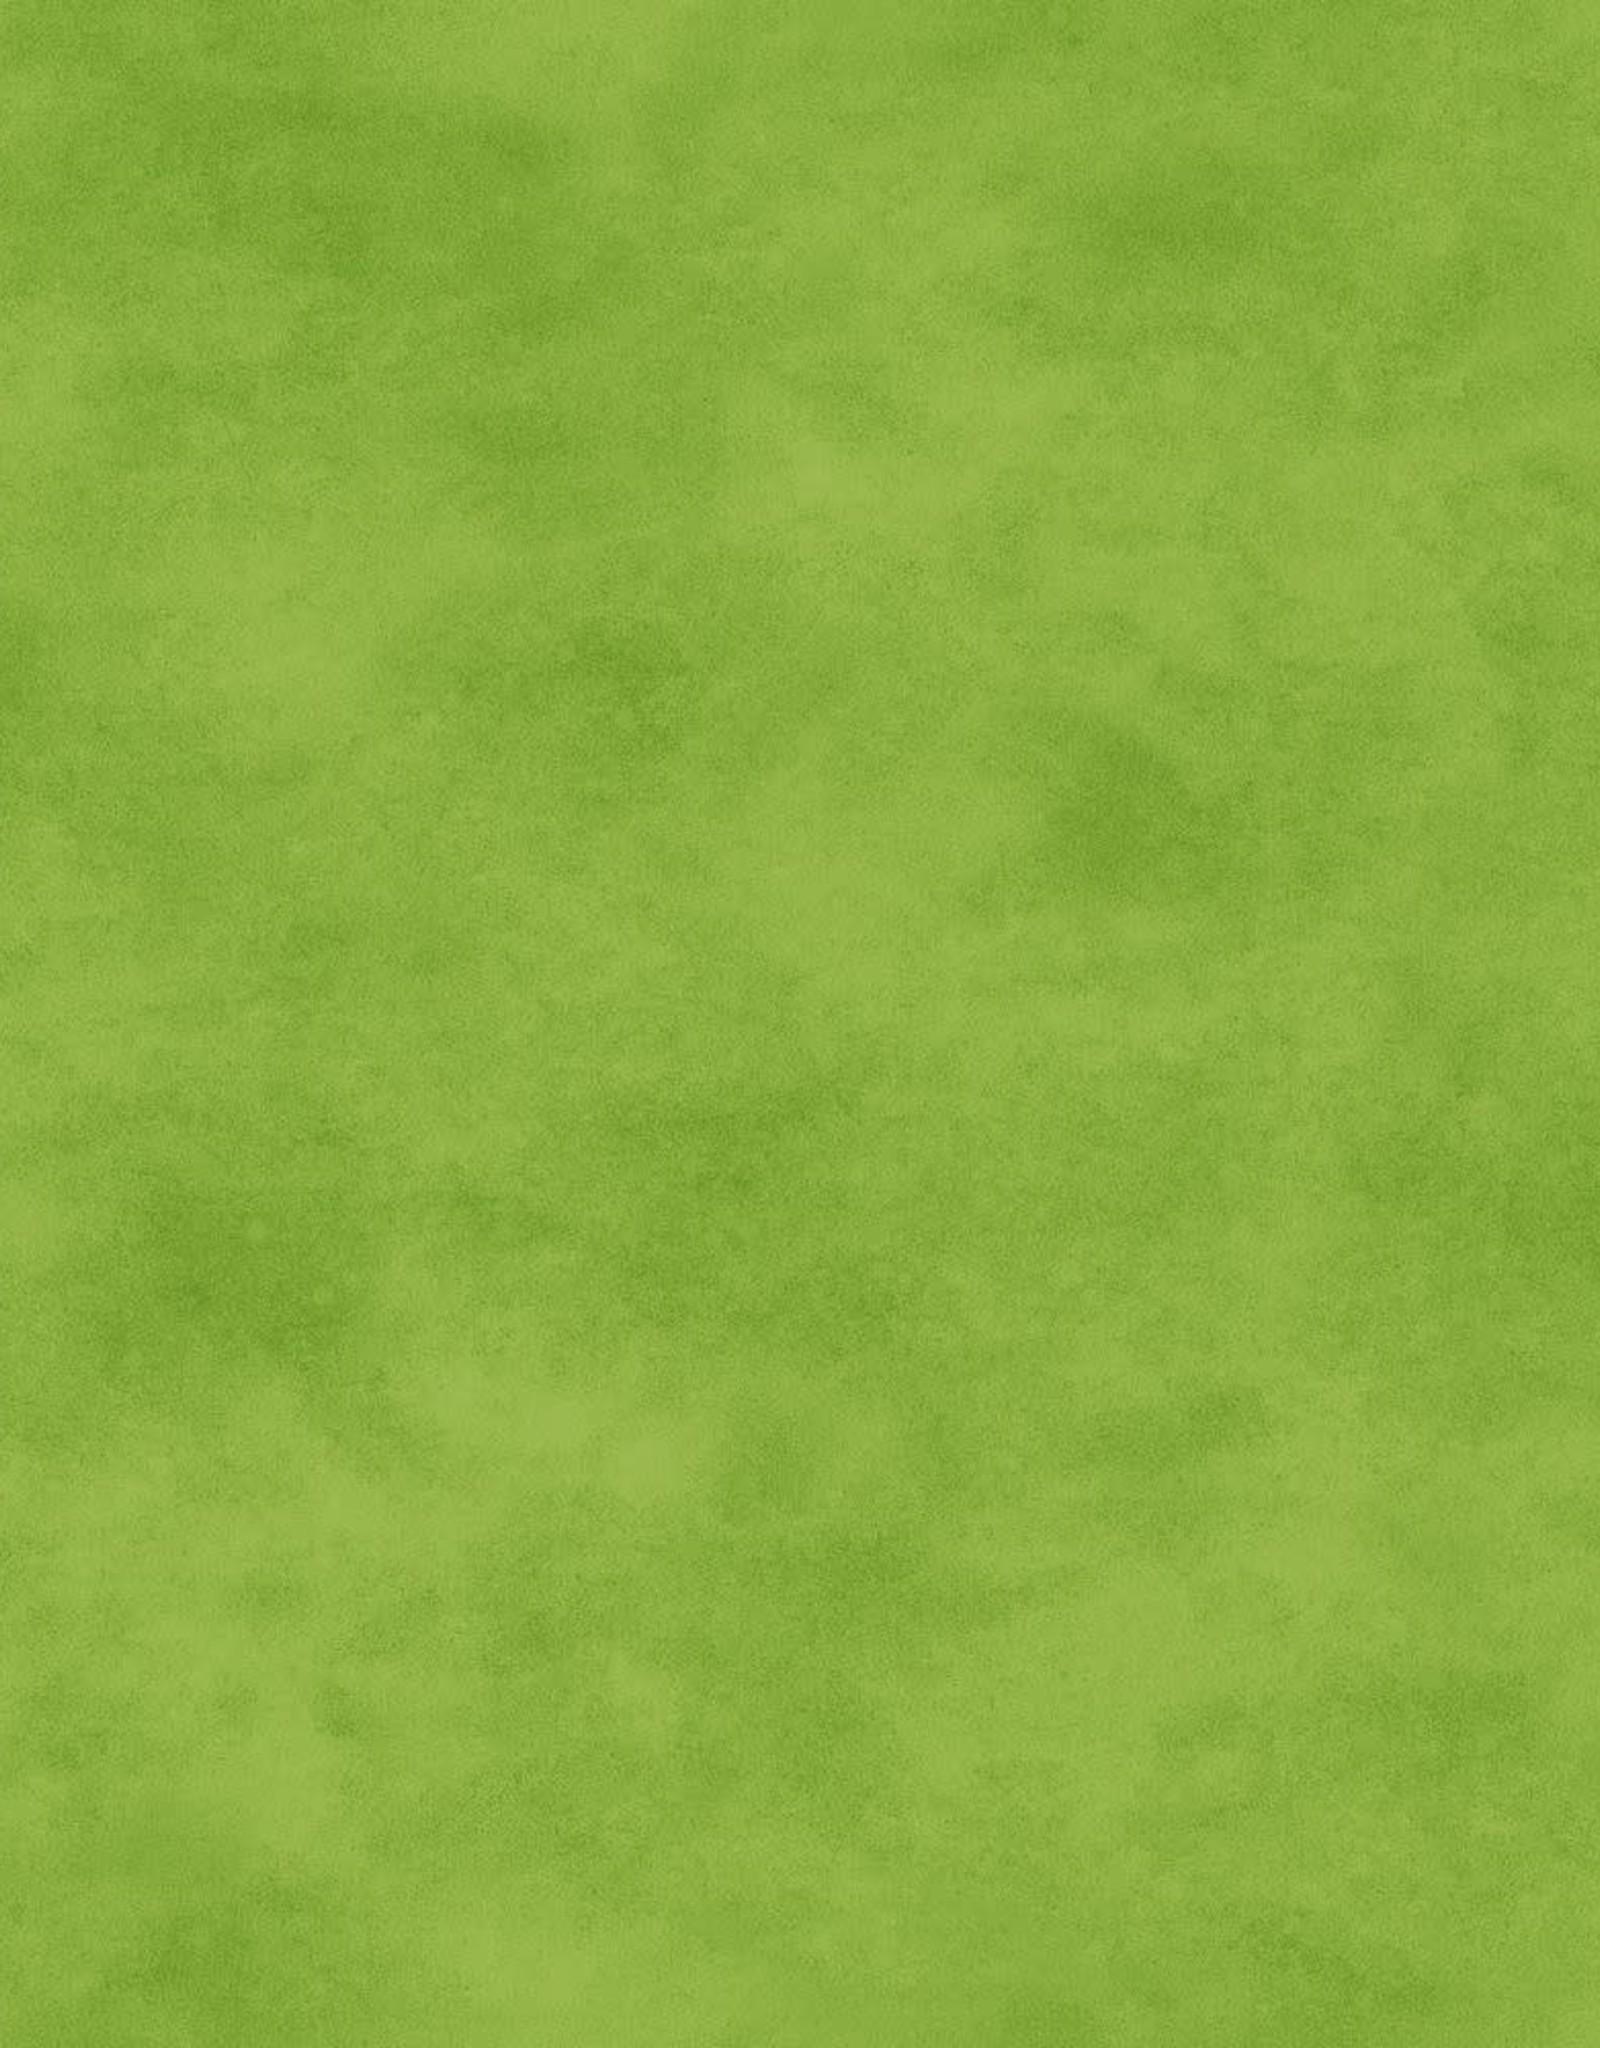 Shadow play fel groen